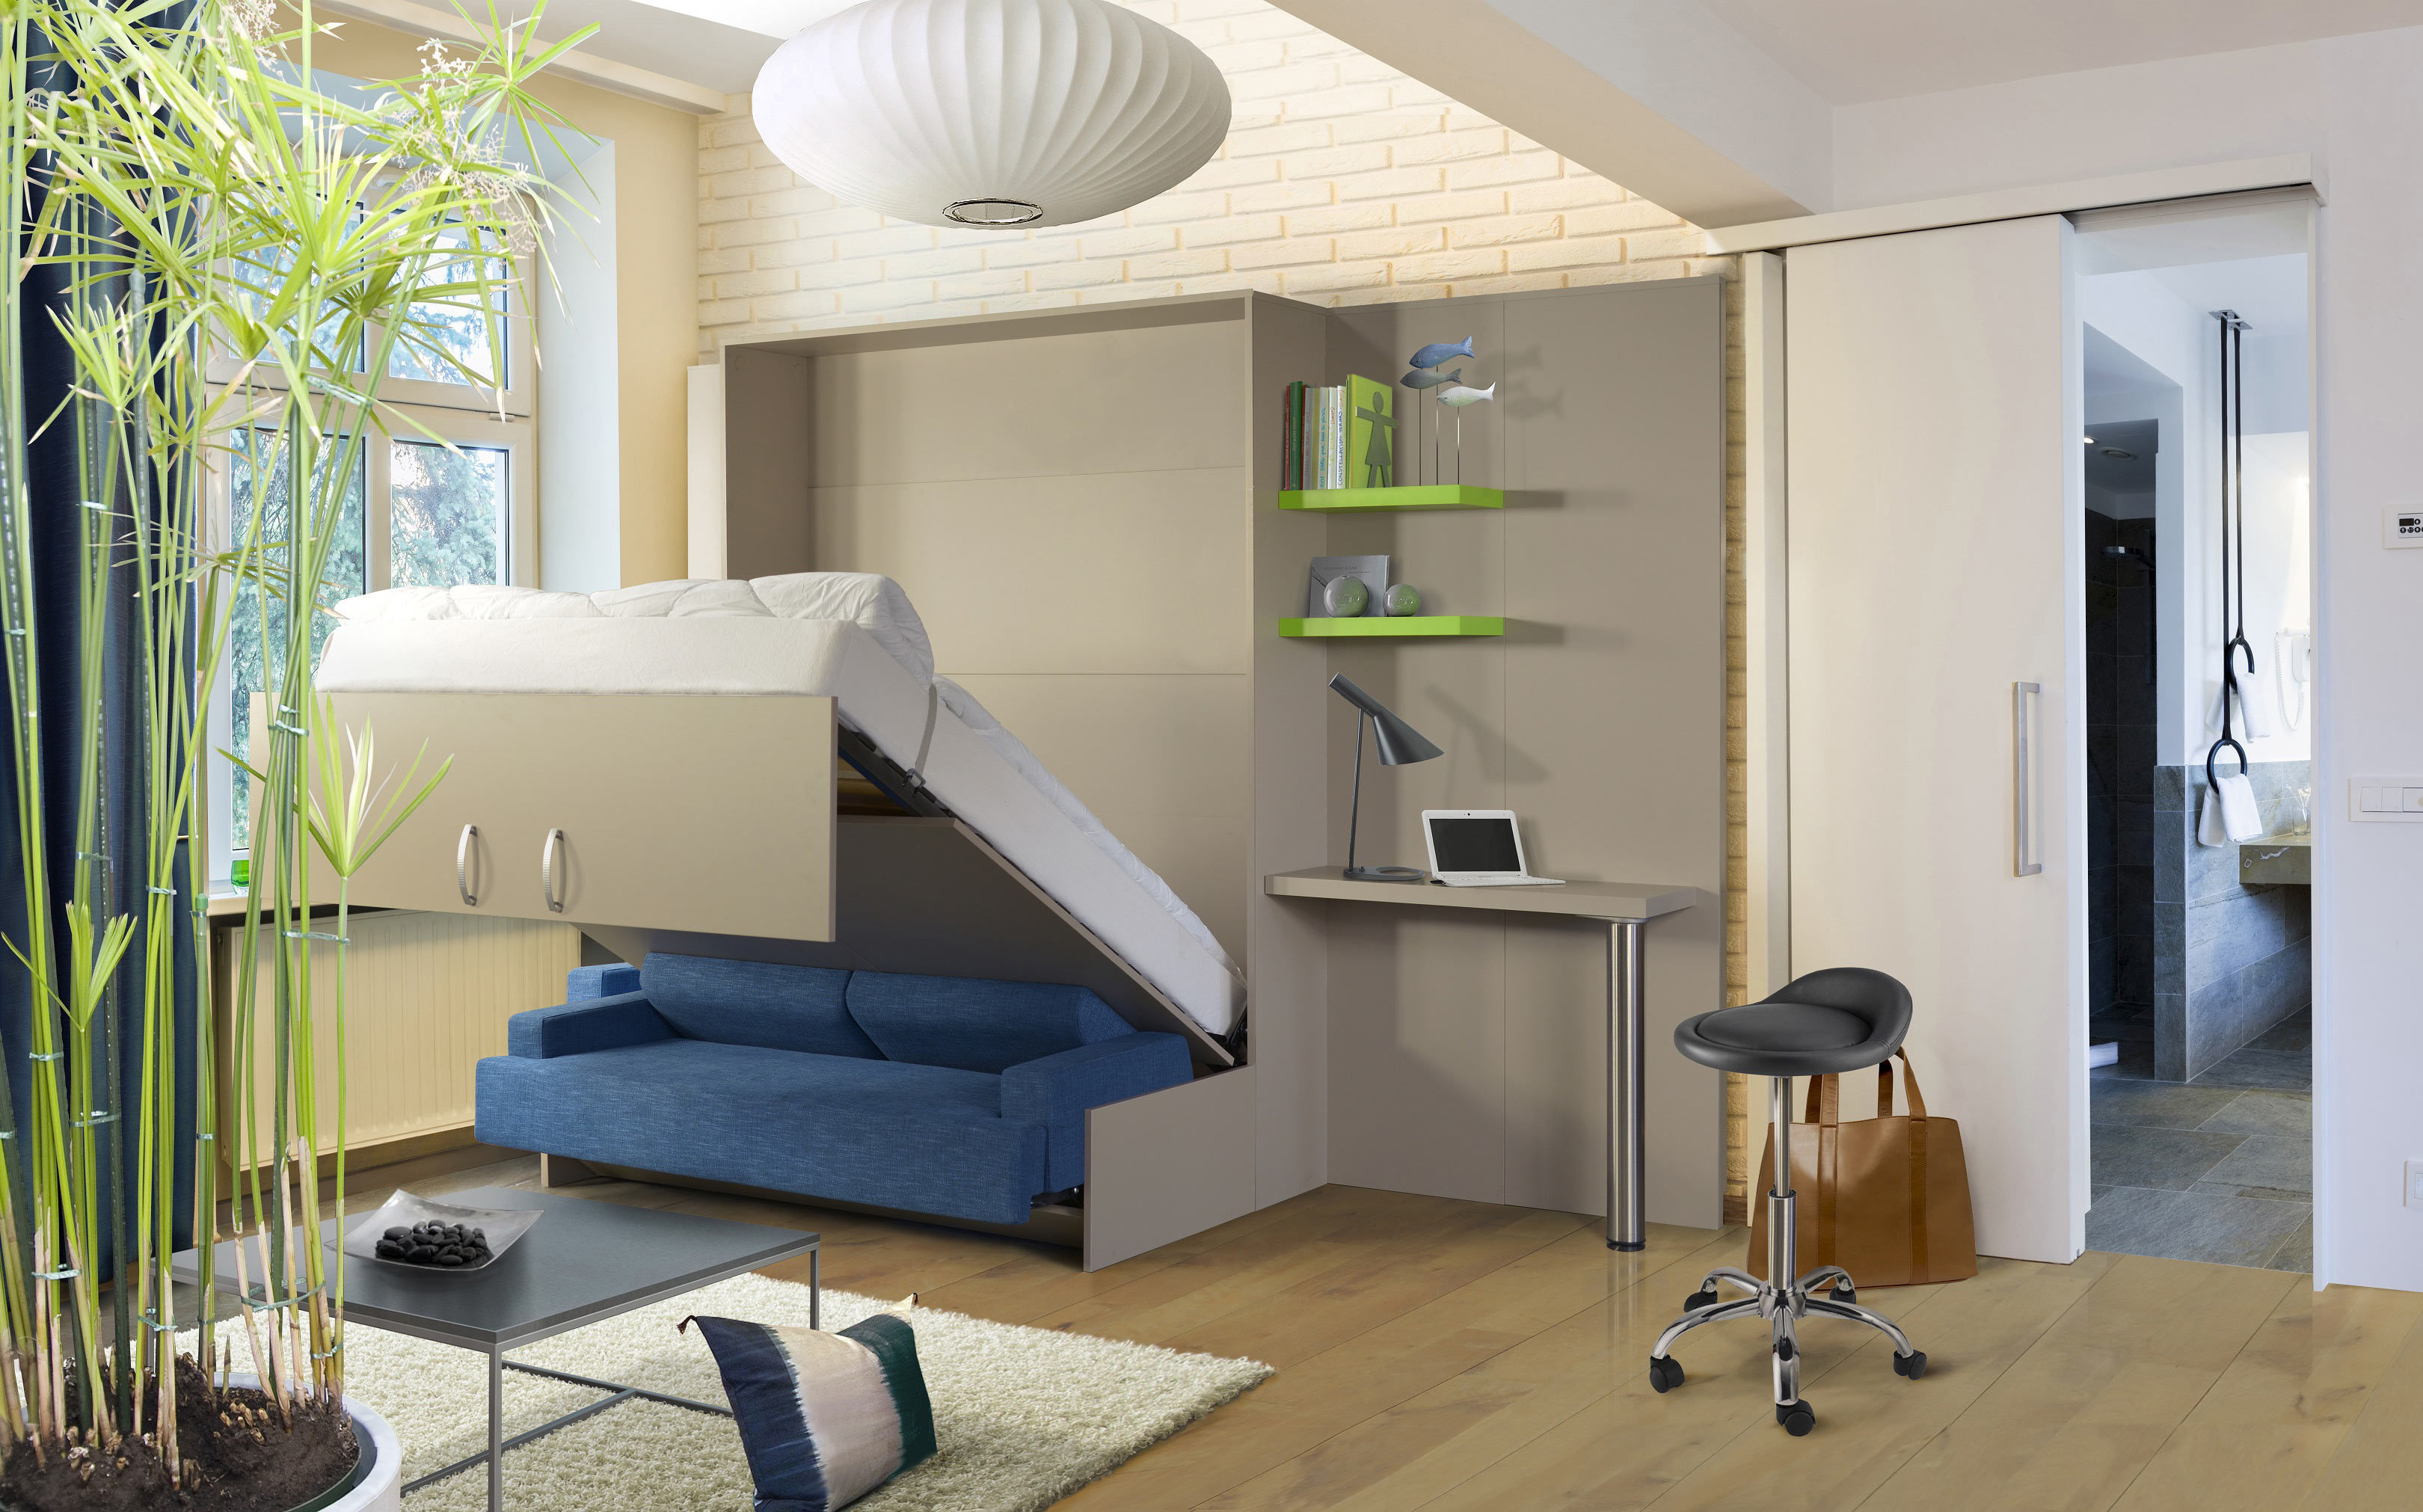 Mix Sofa Wallbed The London Wallbed Company